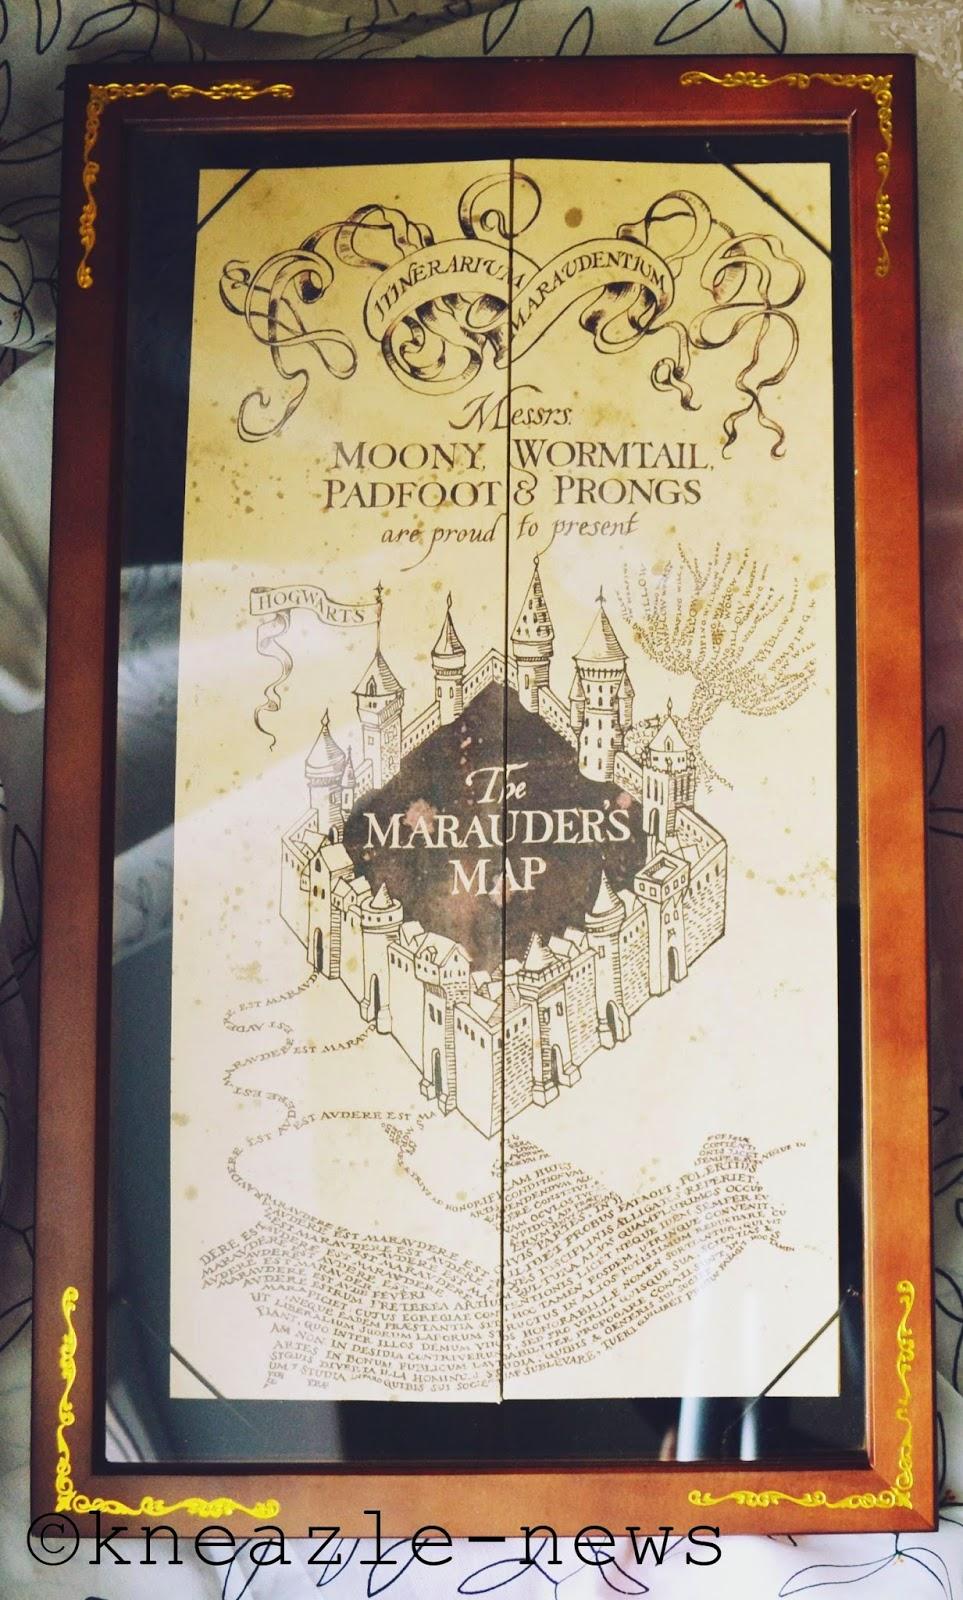 Kneazle News: Marauder's Map Review on illuminati map, erik the red map, wicked map, ajax map, legion map, avengers map, zodiac map, logistics map, civilization map, vikings map, prism map, black ops map, stars map, random map, apocalypse map, love map, cubs map, hogwarts map, terra nova map, excalibur map,